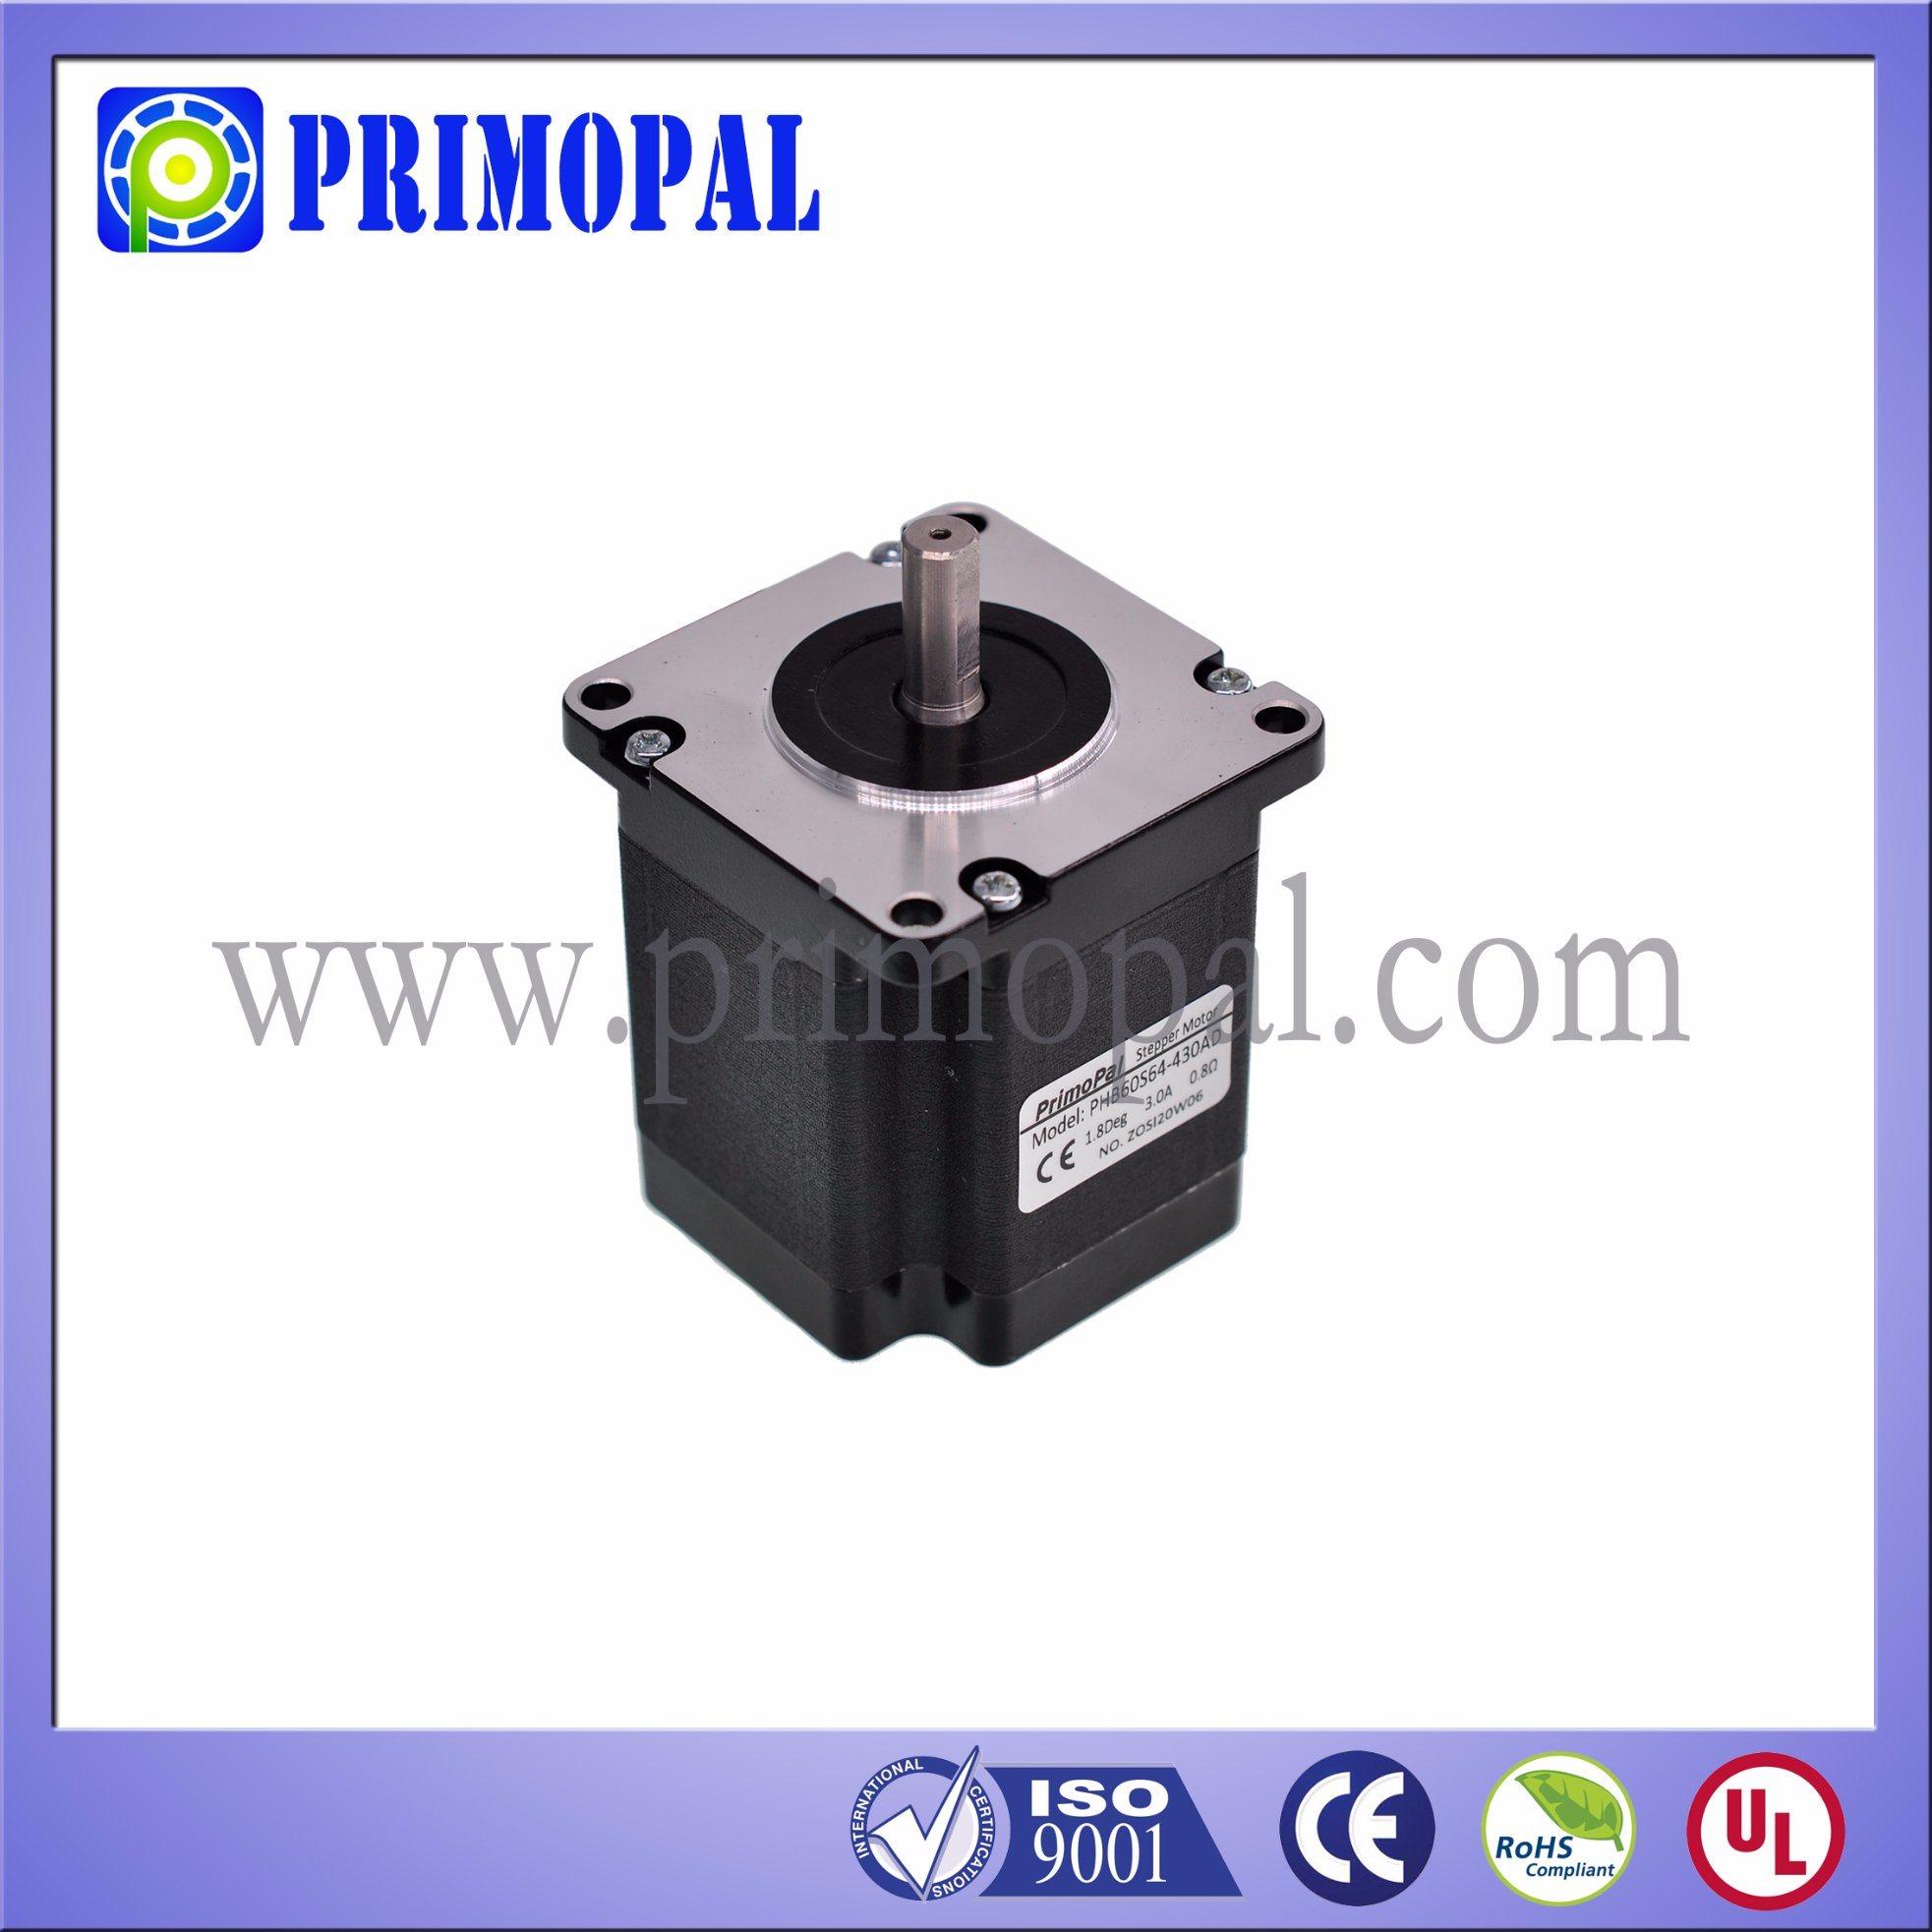 1.8 Step Angle NEMA 24 Square Stepper Motor for Industrial Printer